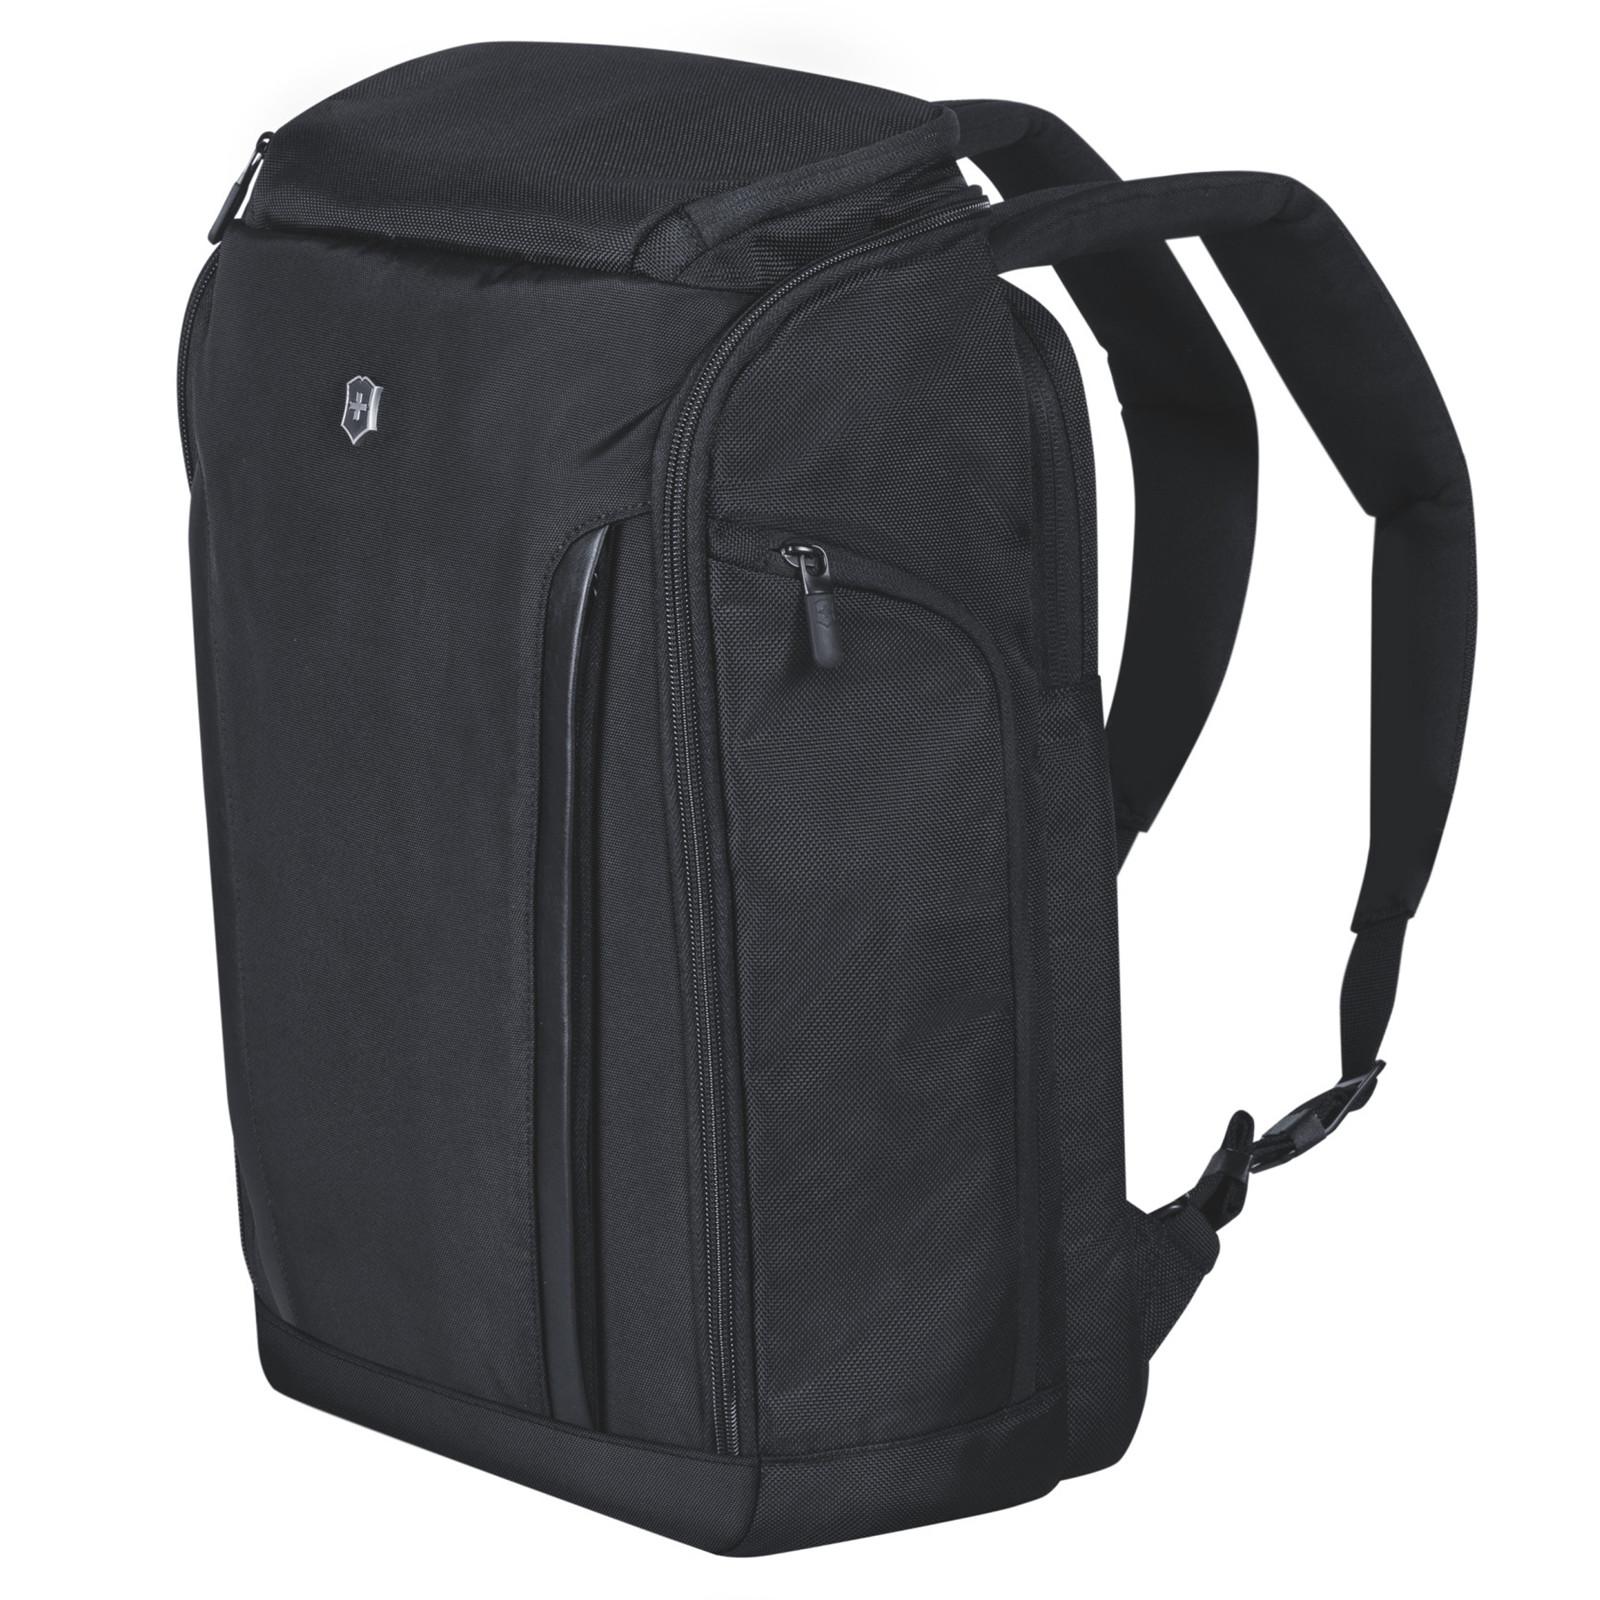 Victorinox Altmont professionel laptop rygsække